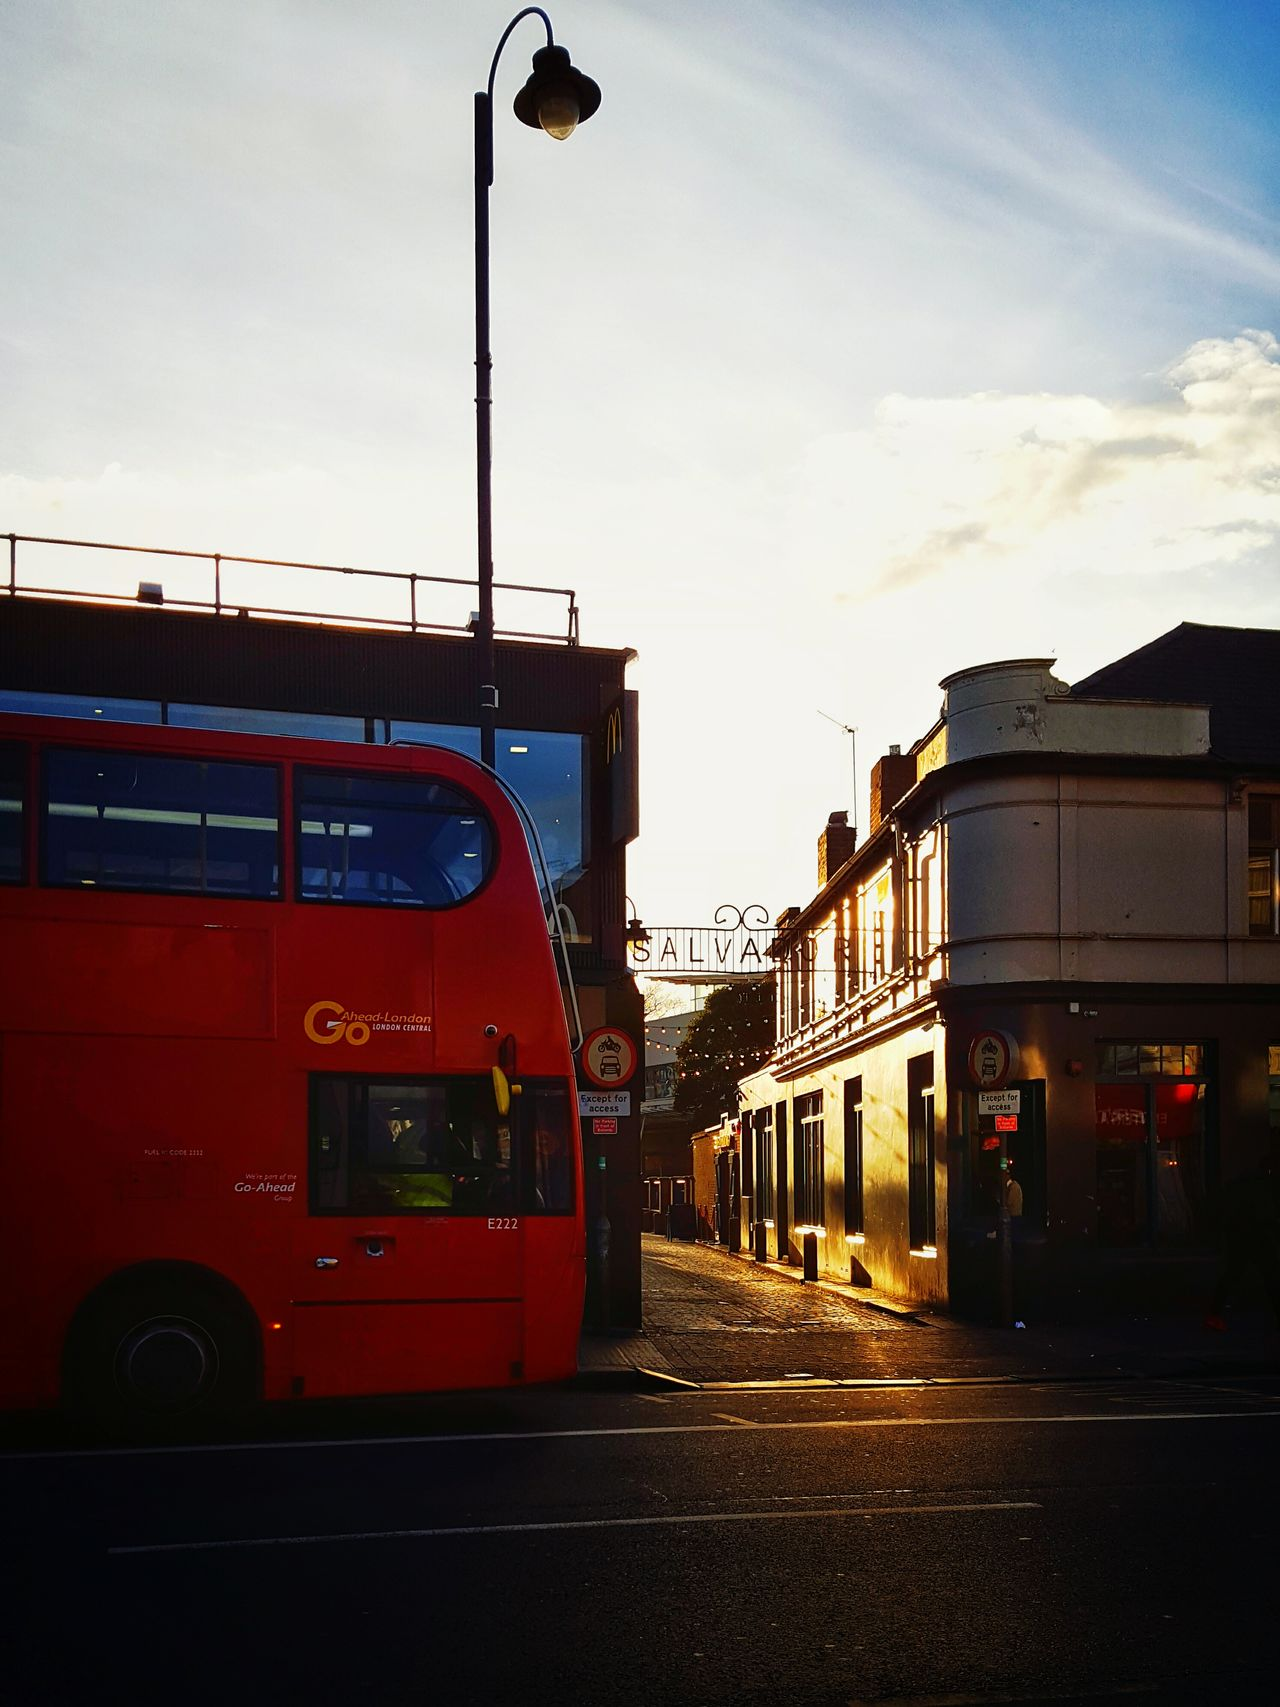 Wintersun Streetphotography Transportation Public Transportation Londonbus Travel City Silhouette City Cityscape LONDON❤ Travel Destinations London Architecture The City Light Light And Shadows